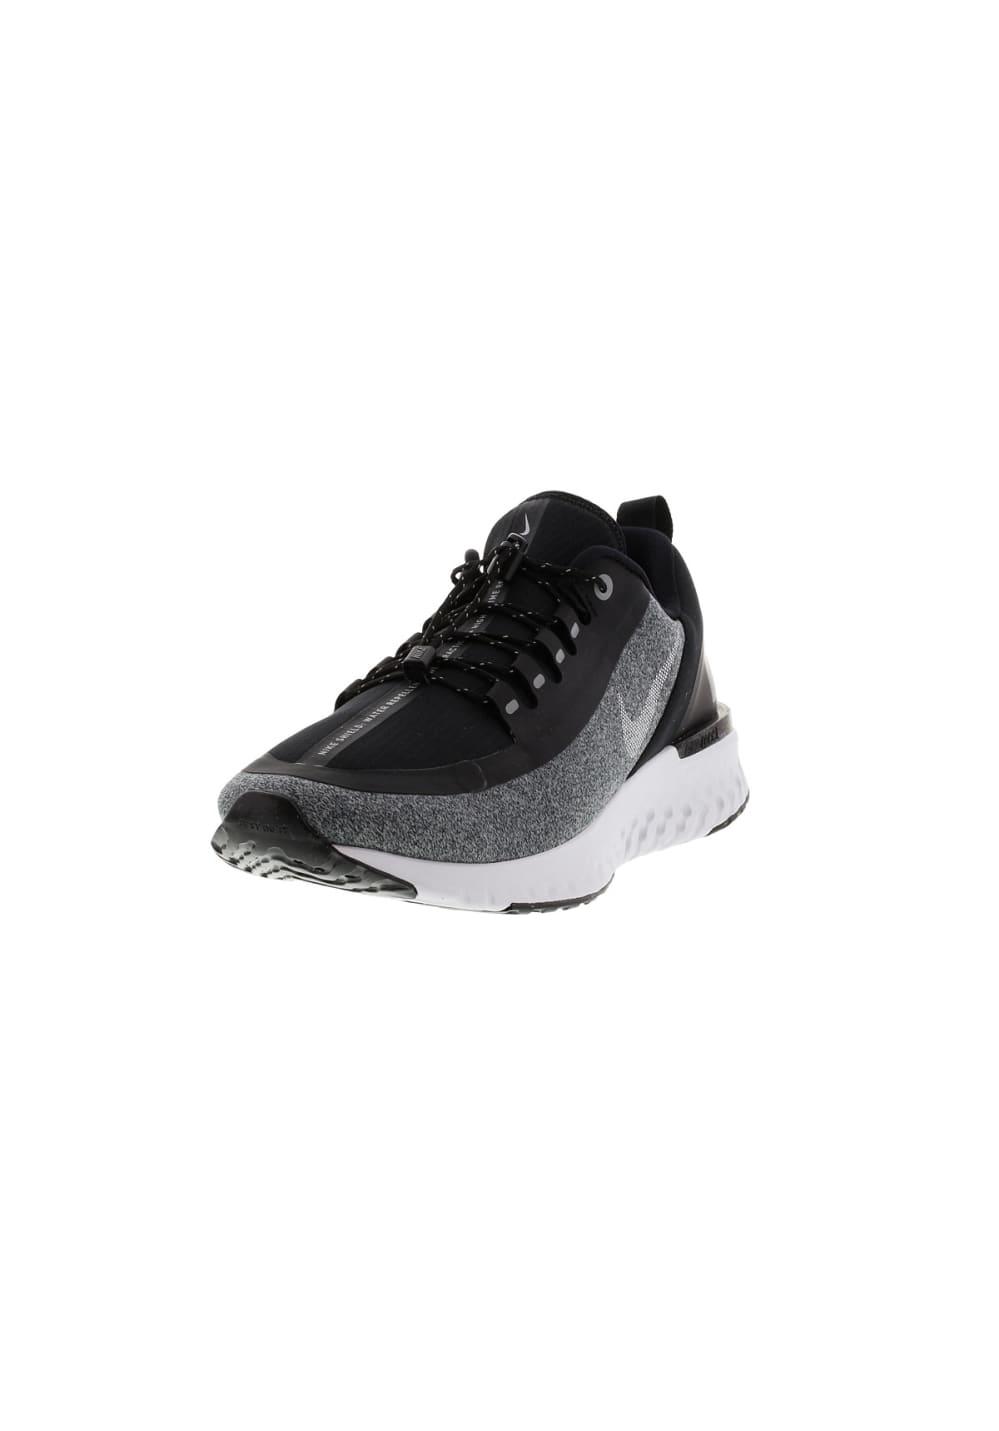 super popular 263c0 d7cbb Nike Odyssey React Shield - Running shoes for Men - Black